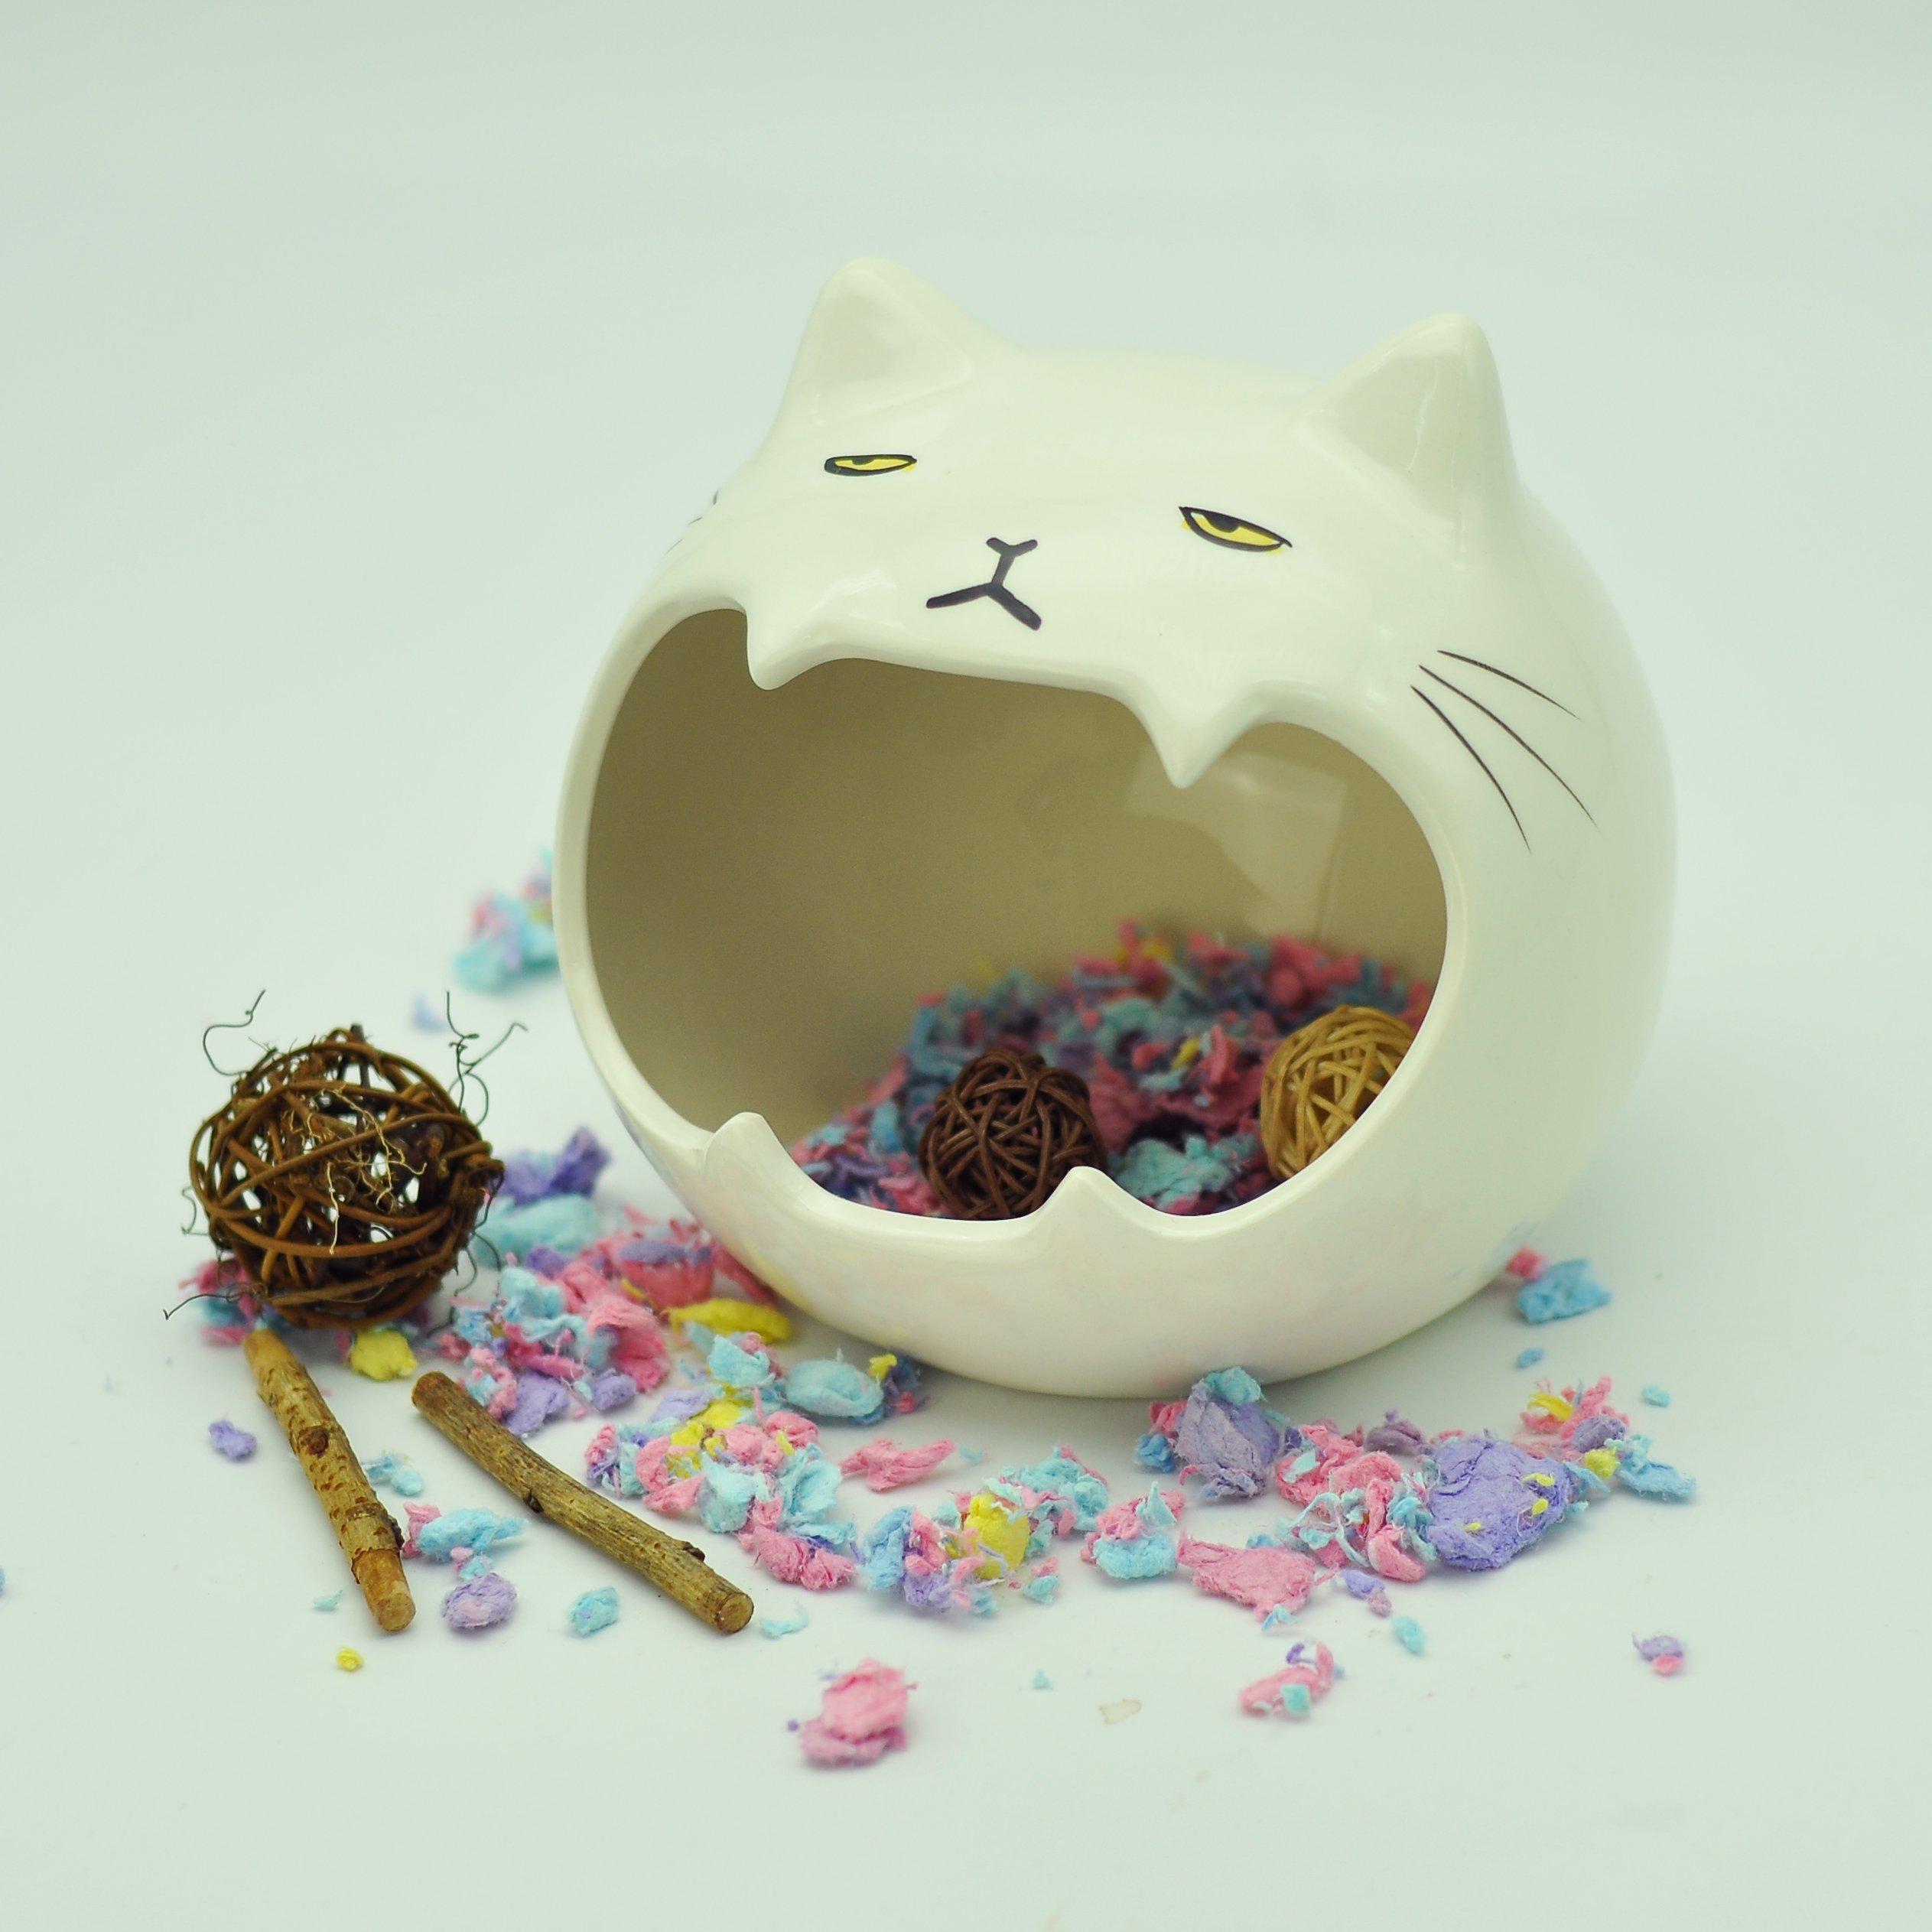 Niteangel Ceramic Small Animal Hideout & Bath Pot, Hamsters Gerbils and Rats Home (cat, 6'' x 5.75'' x 5.25'' (W x D x H))